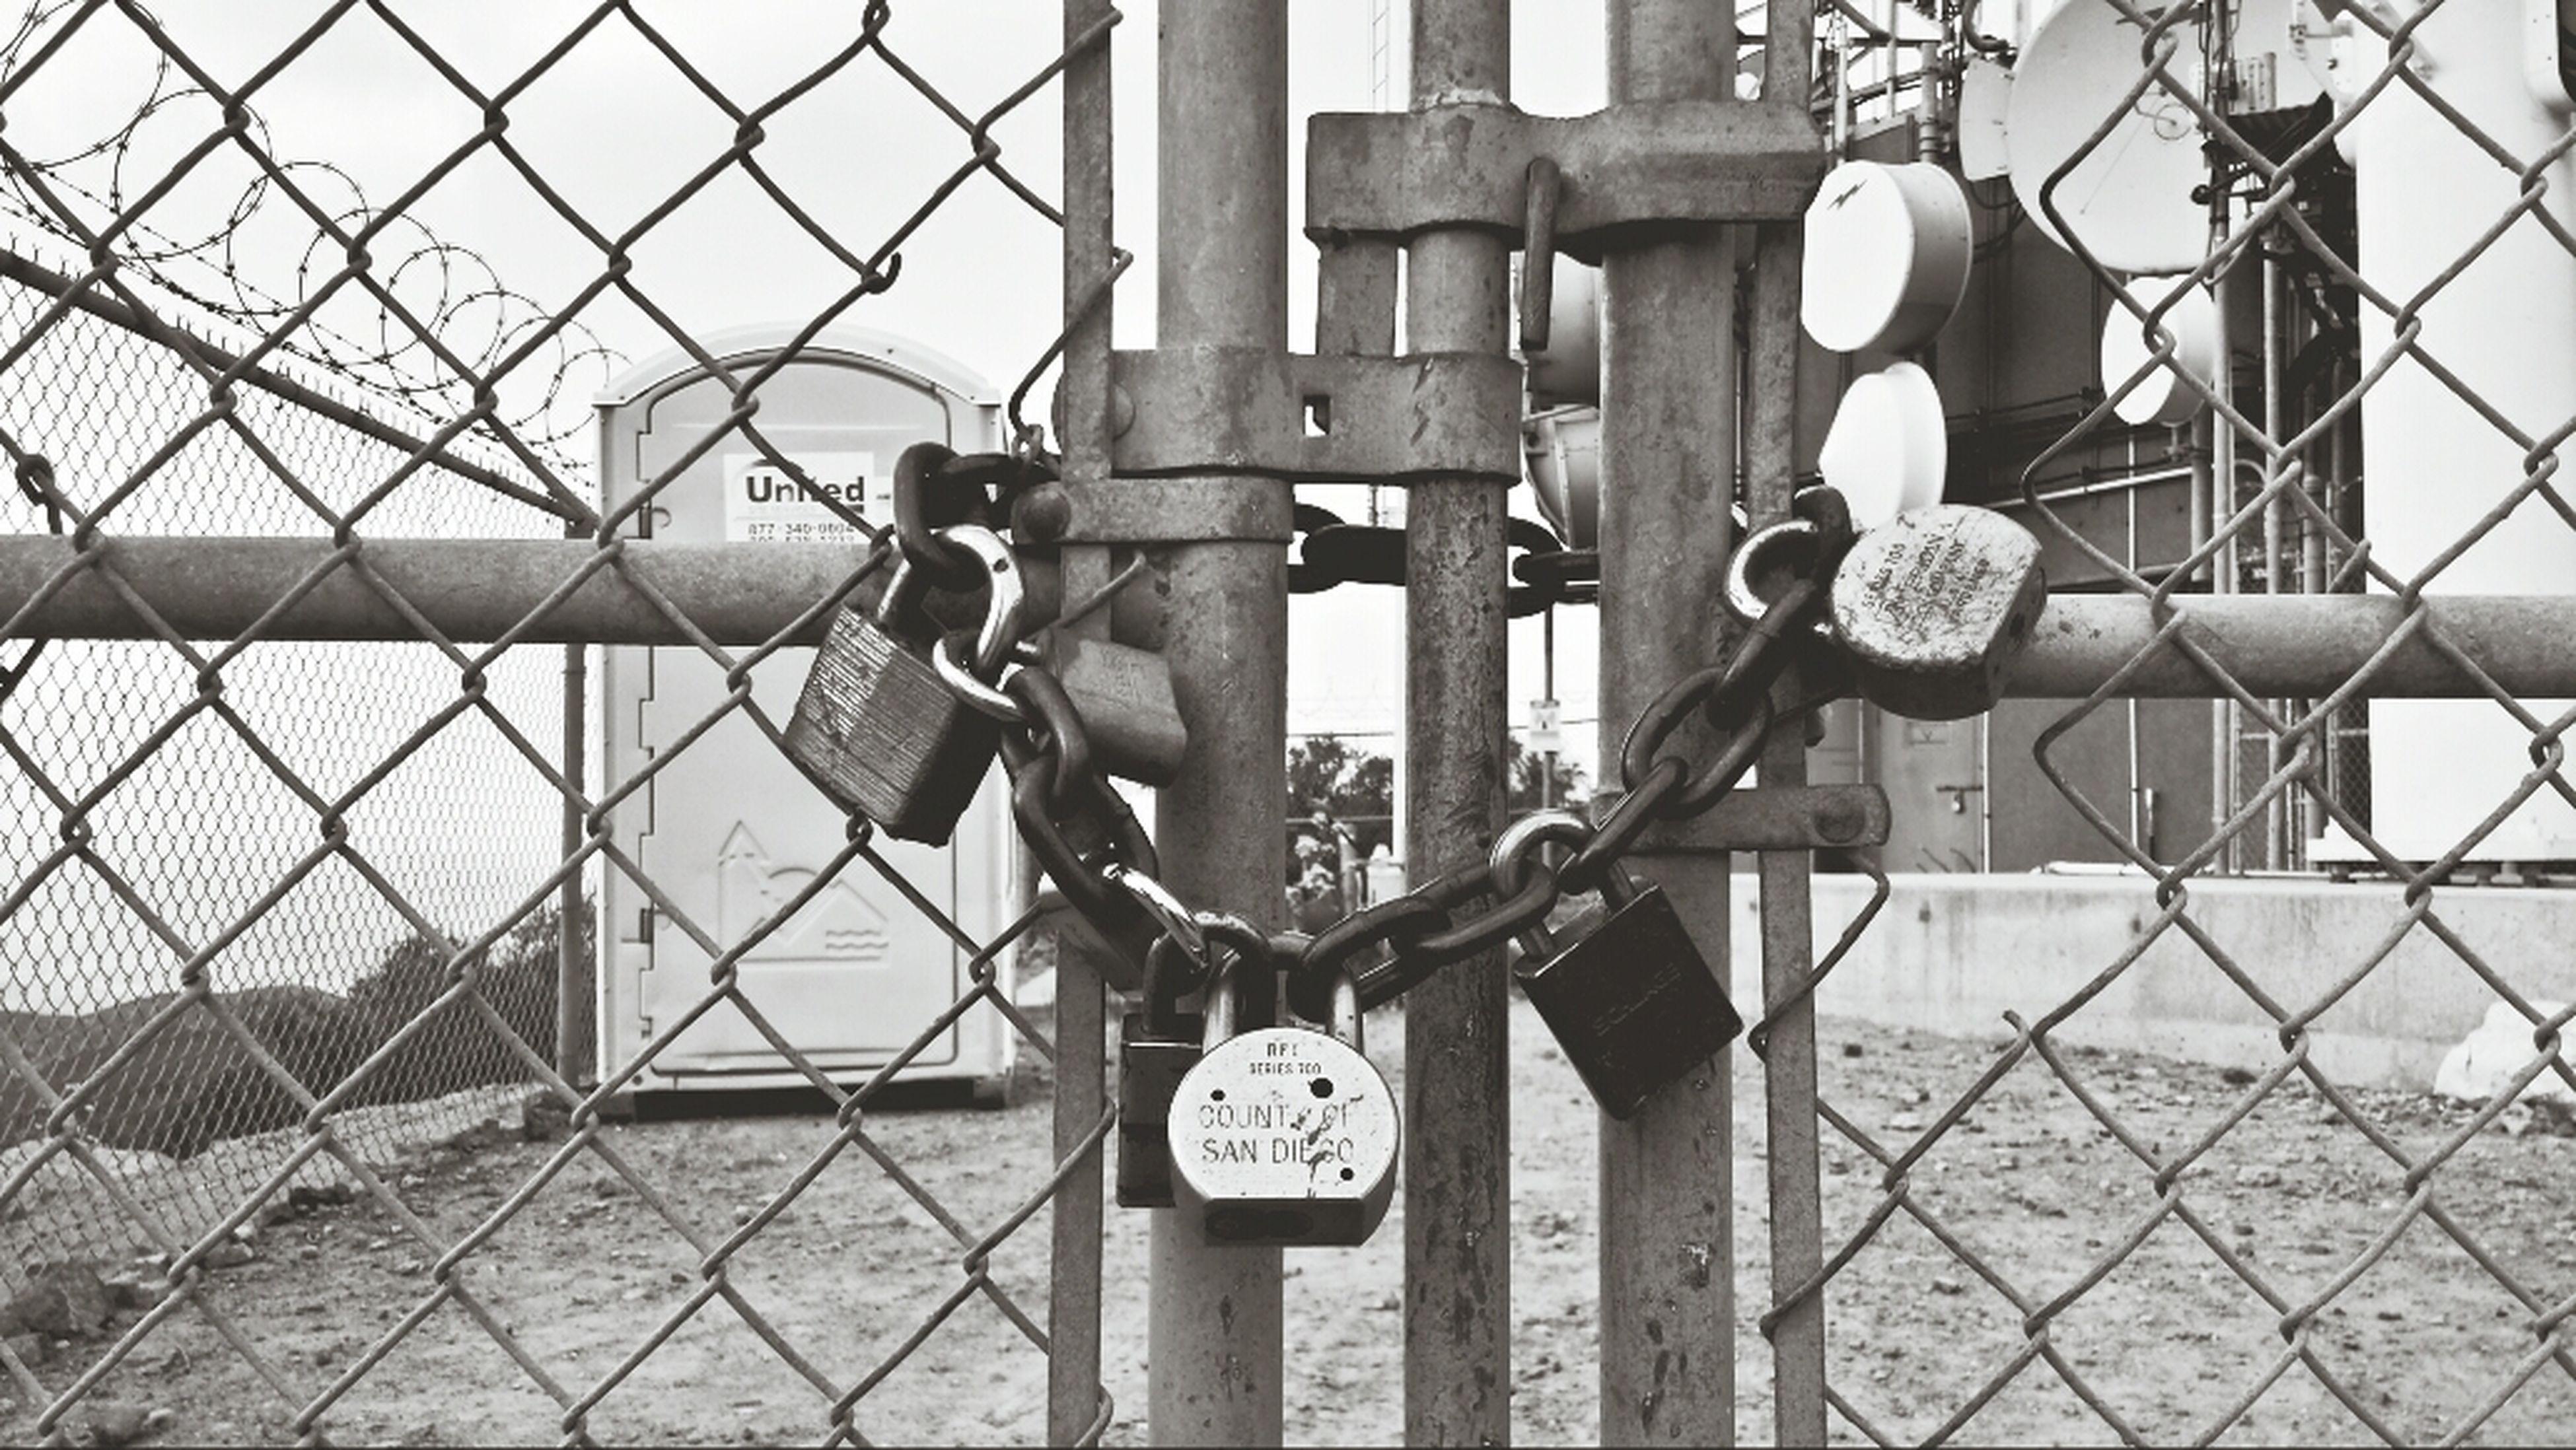 Fence Cowelsmountain Black & White Lock